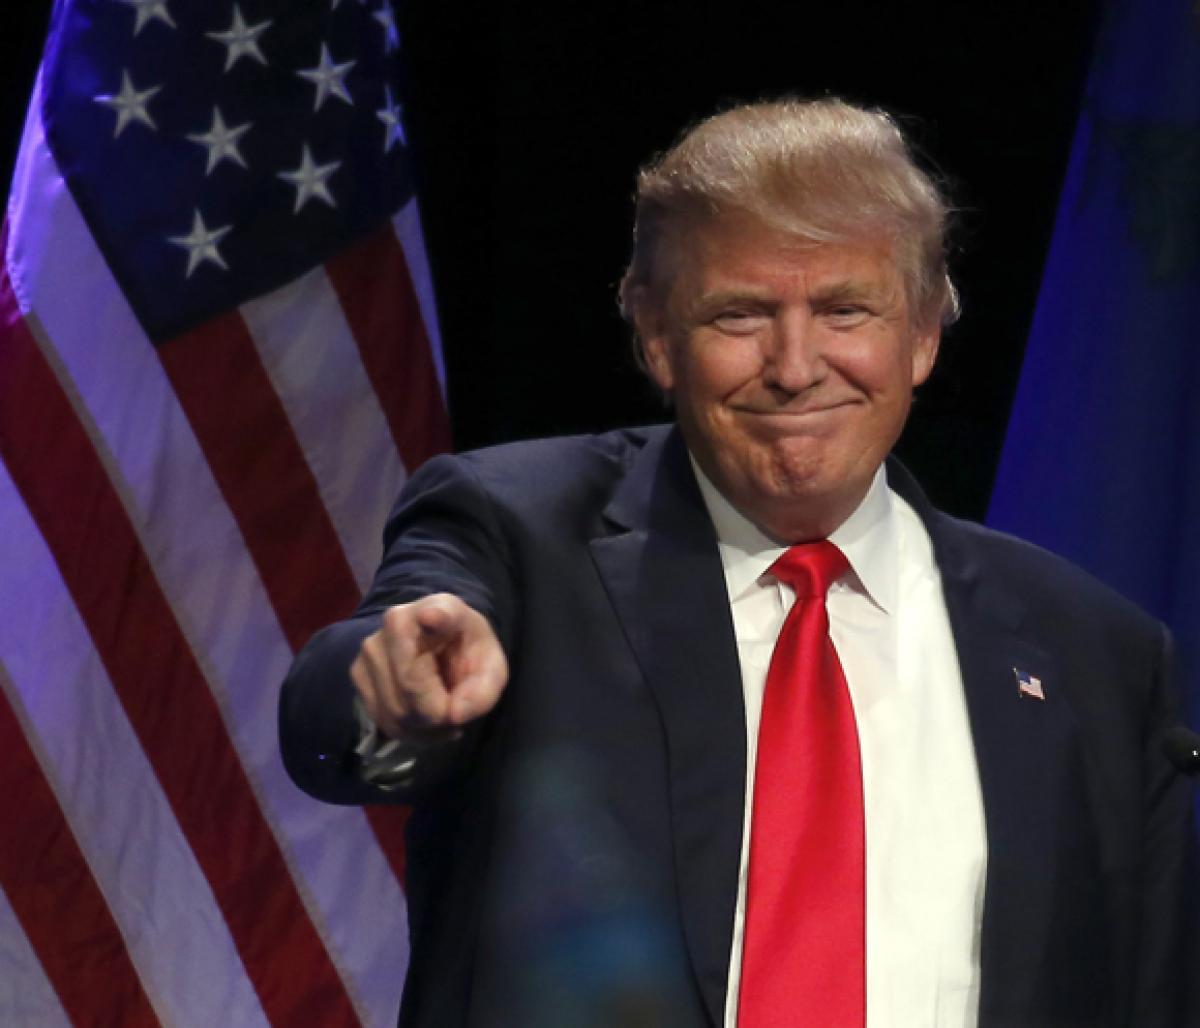 Government Shutdown S Saddest Photo Goes Viral: Trump's Shutdown Is Now Endangering Federal Investigations